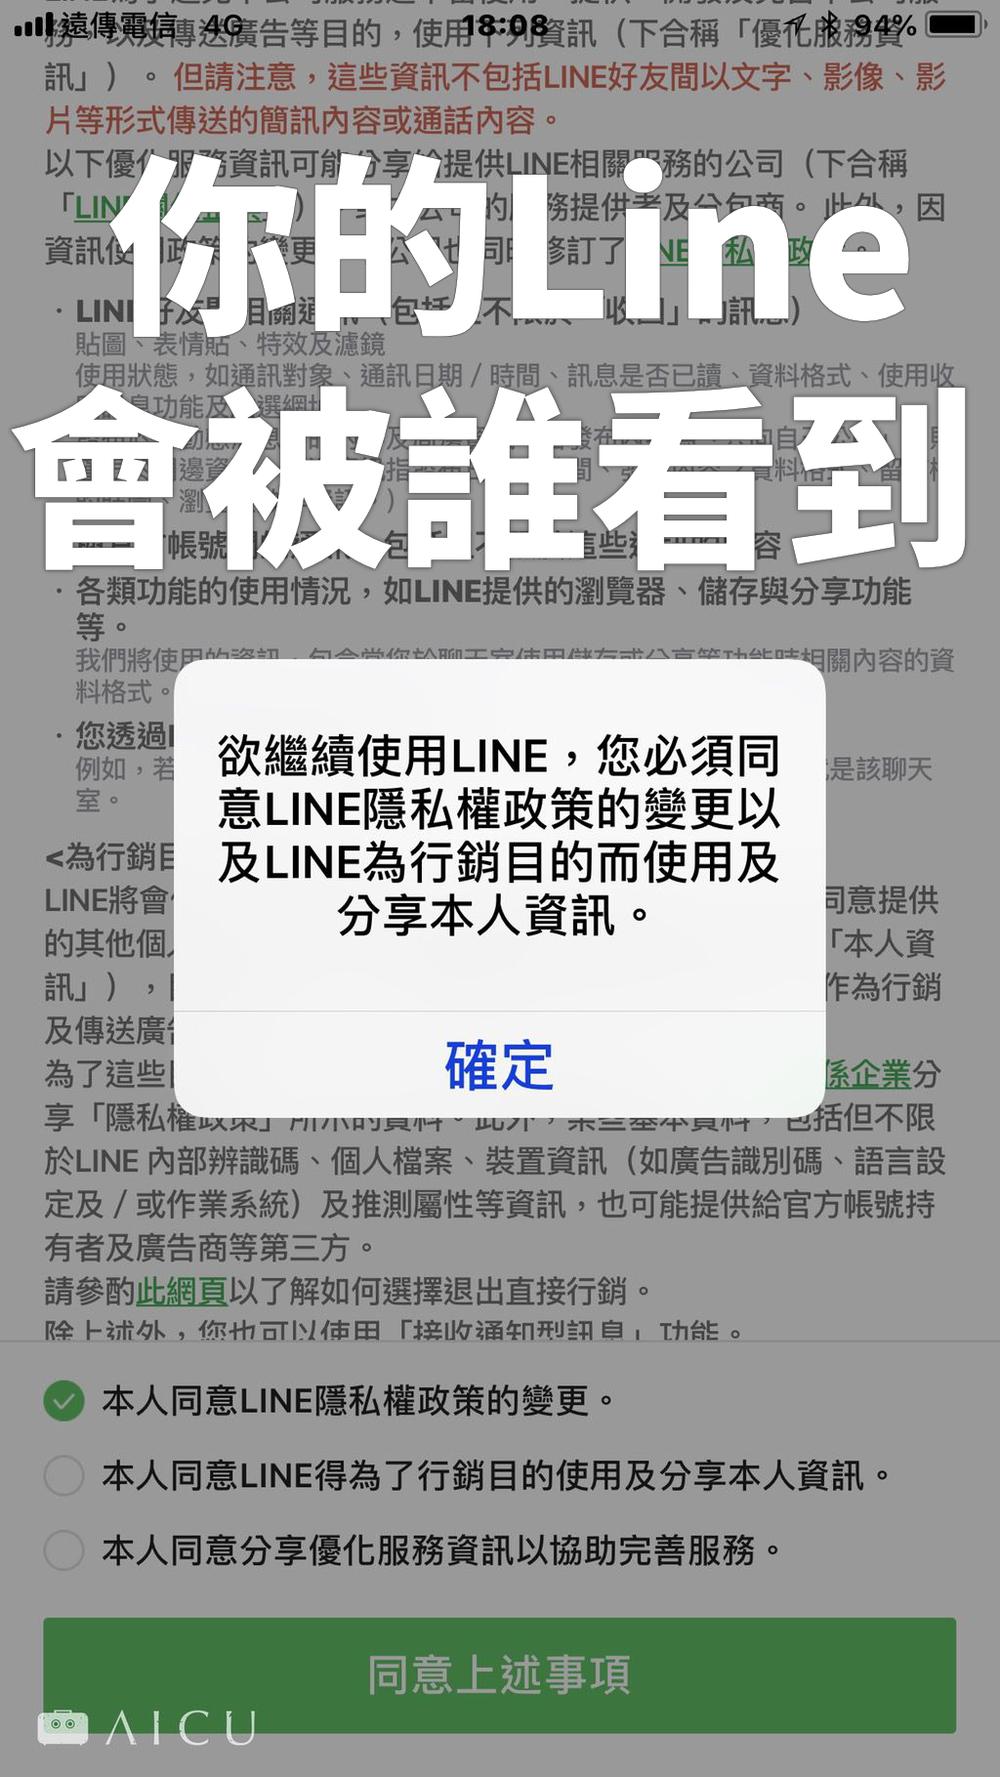 line0000.png